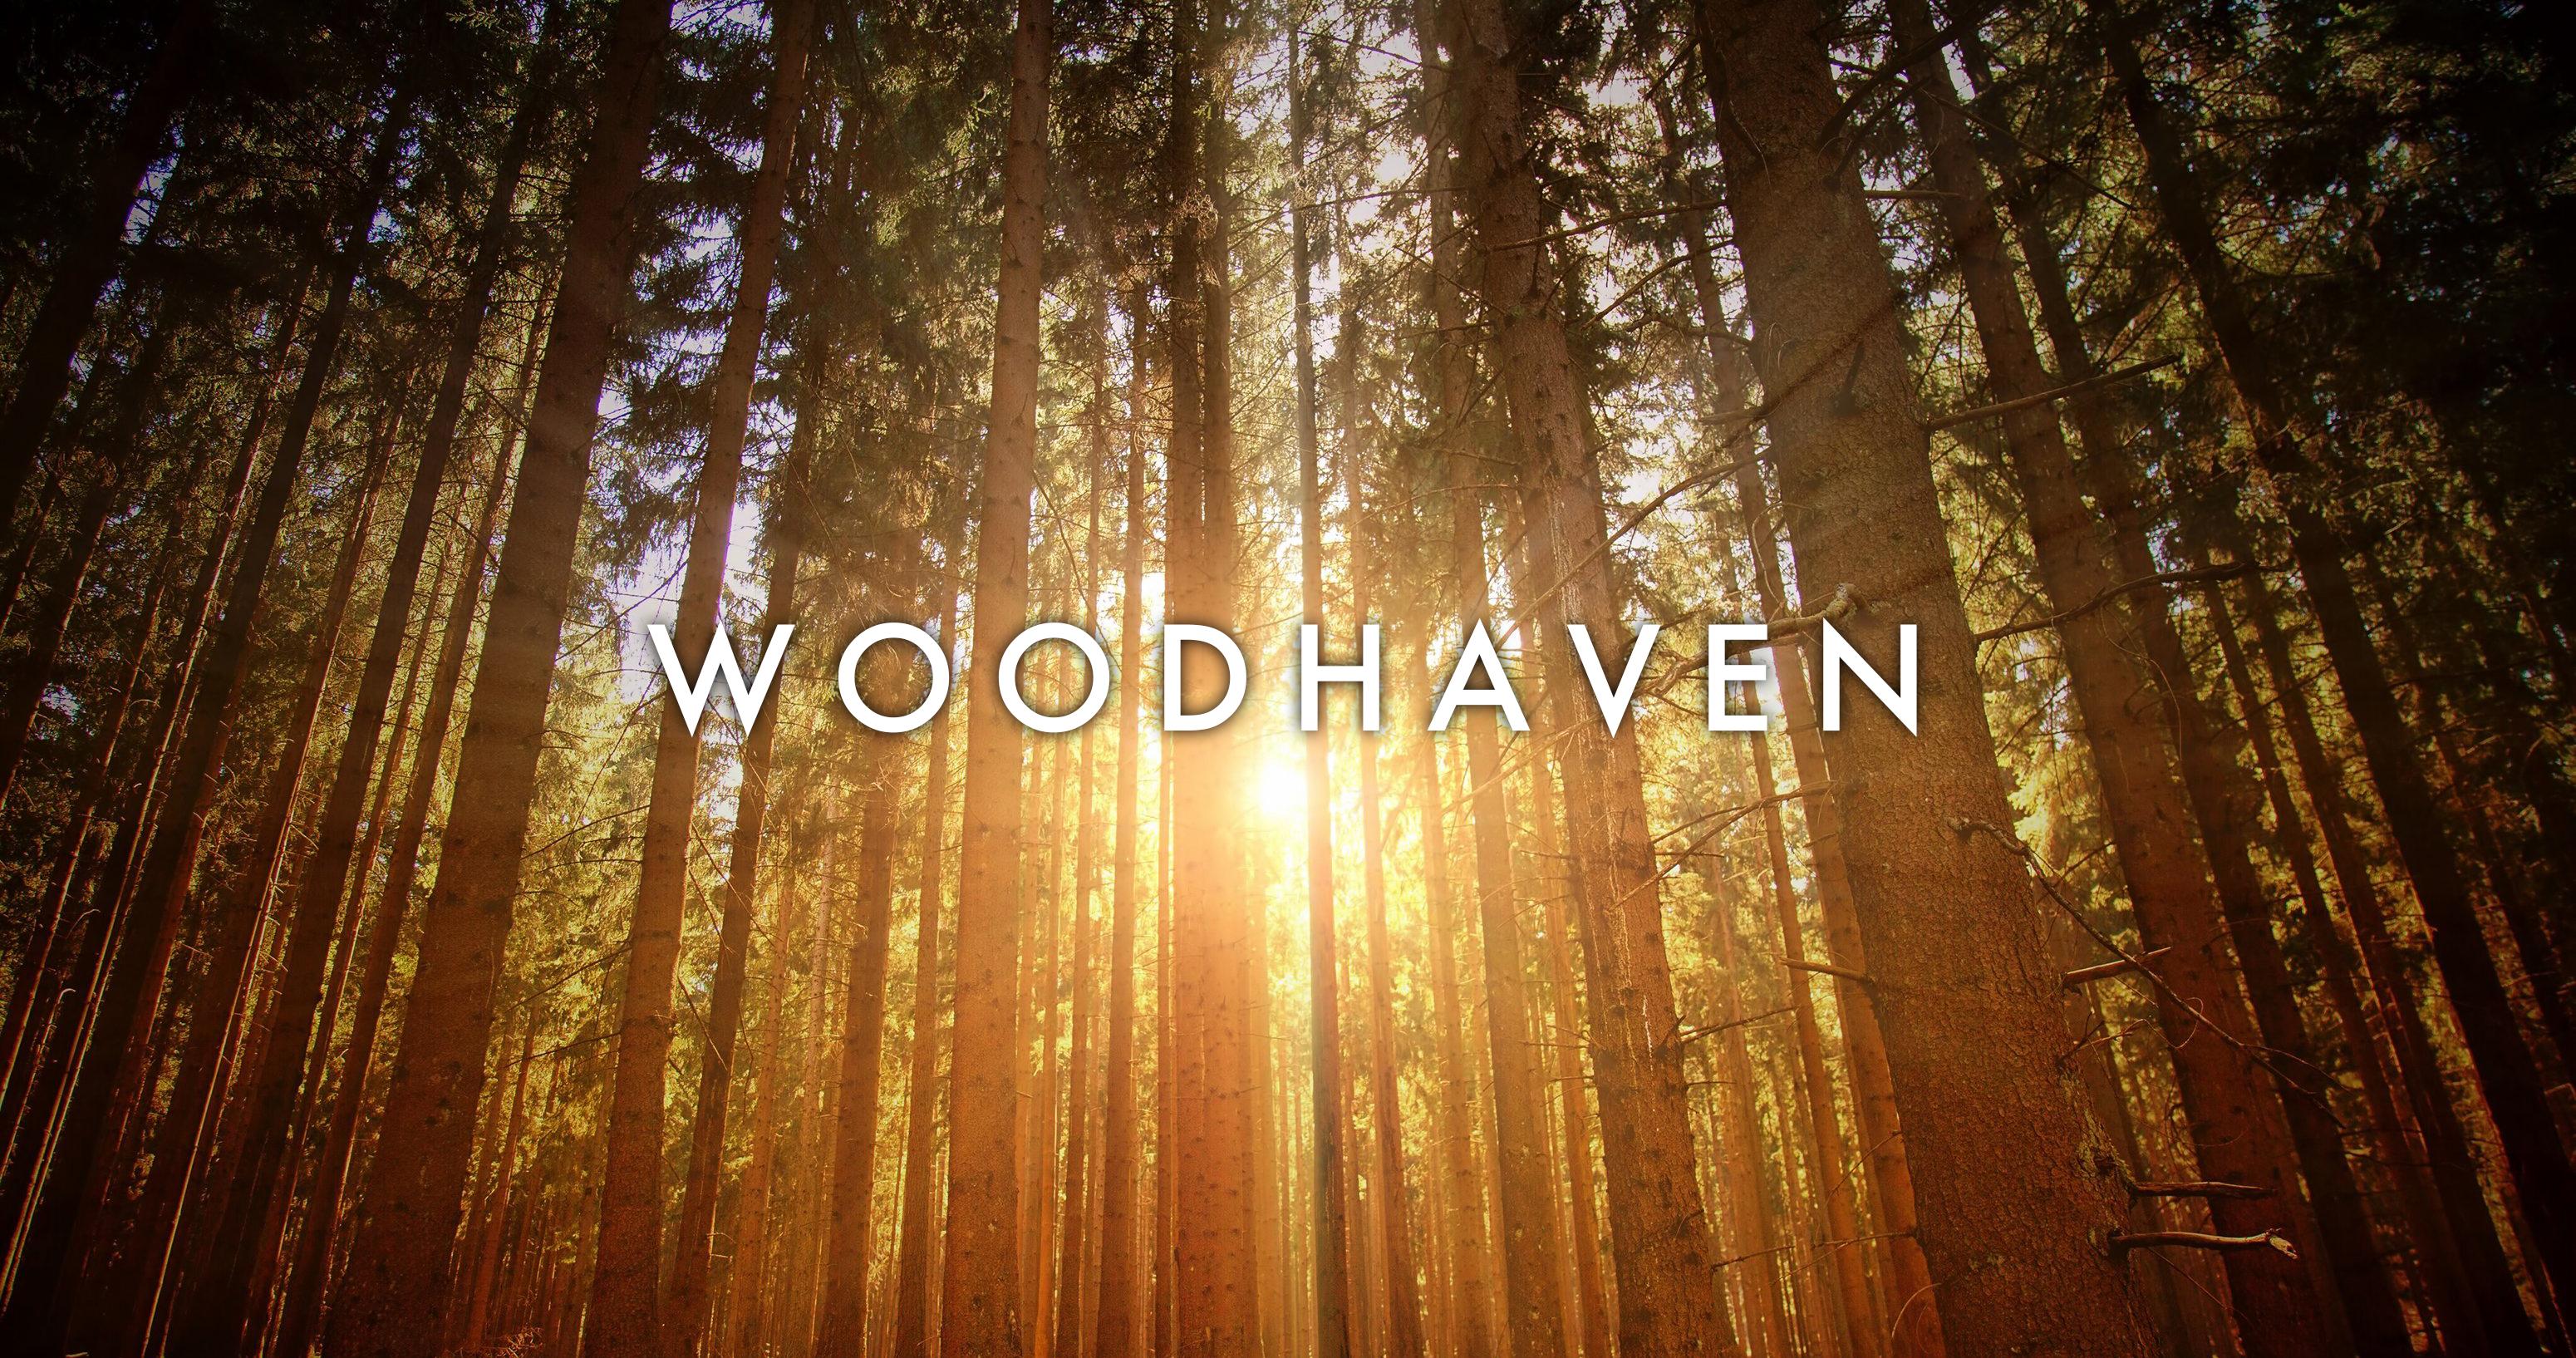 woodhaven, lexington, ma